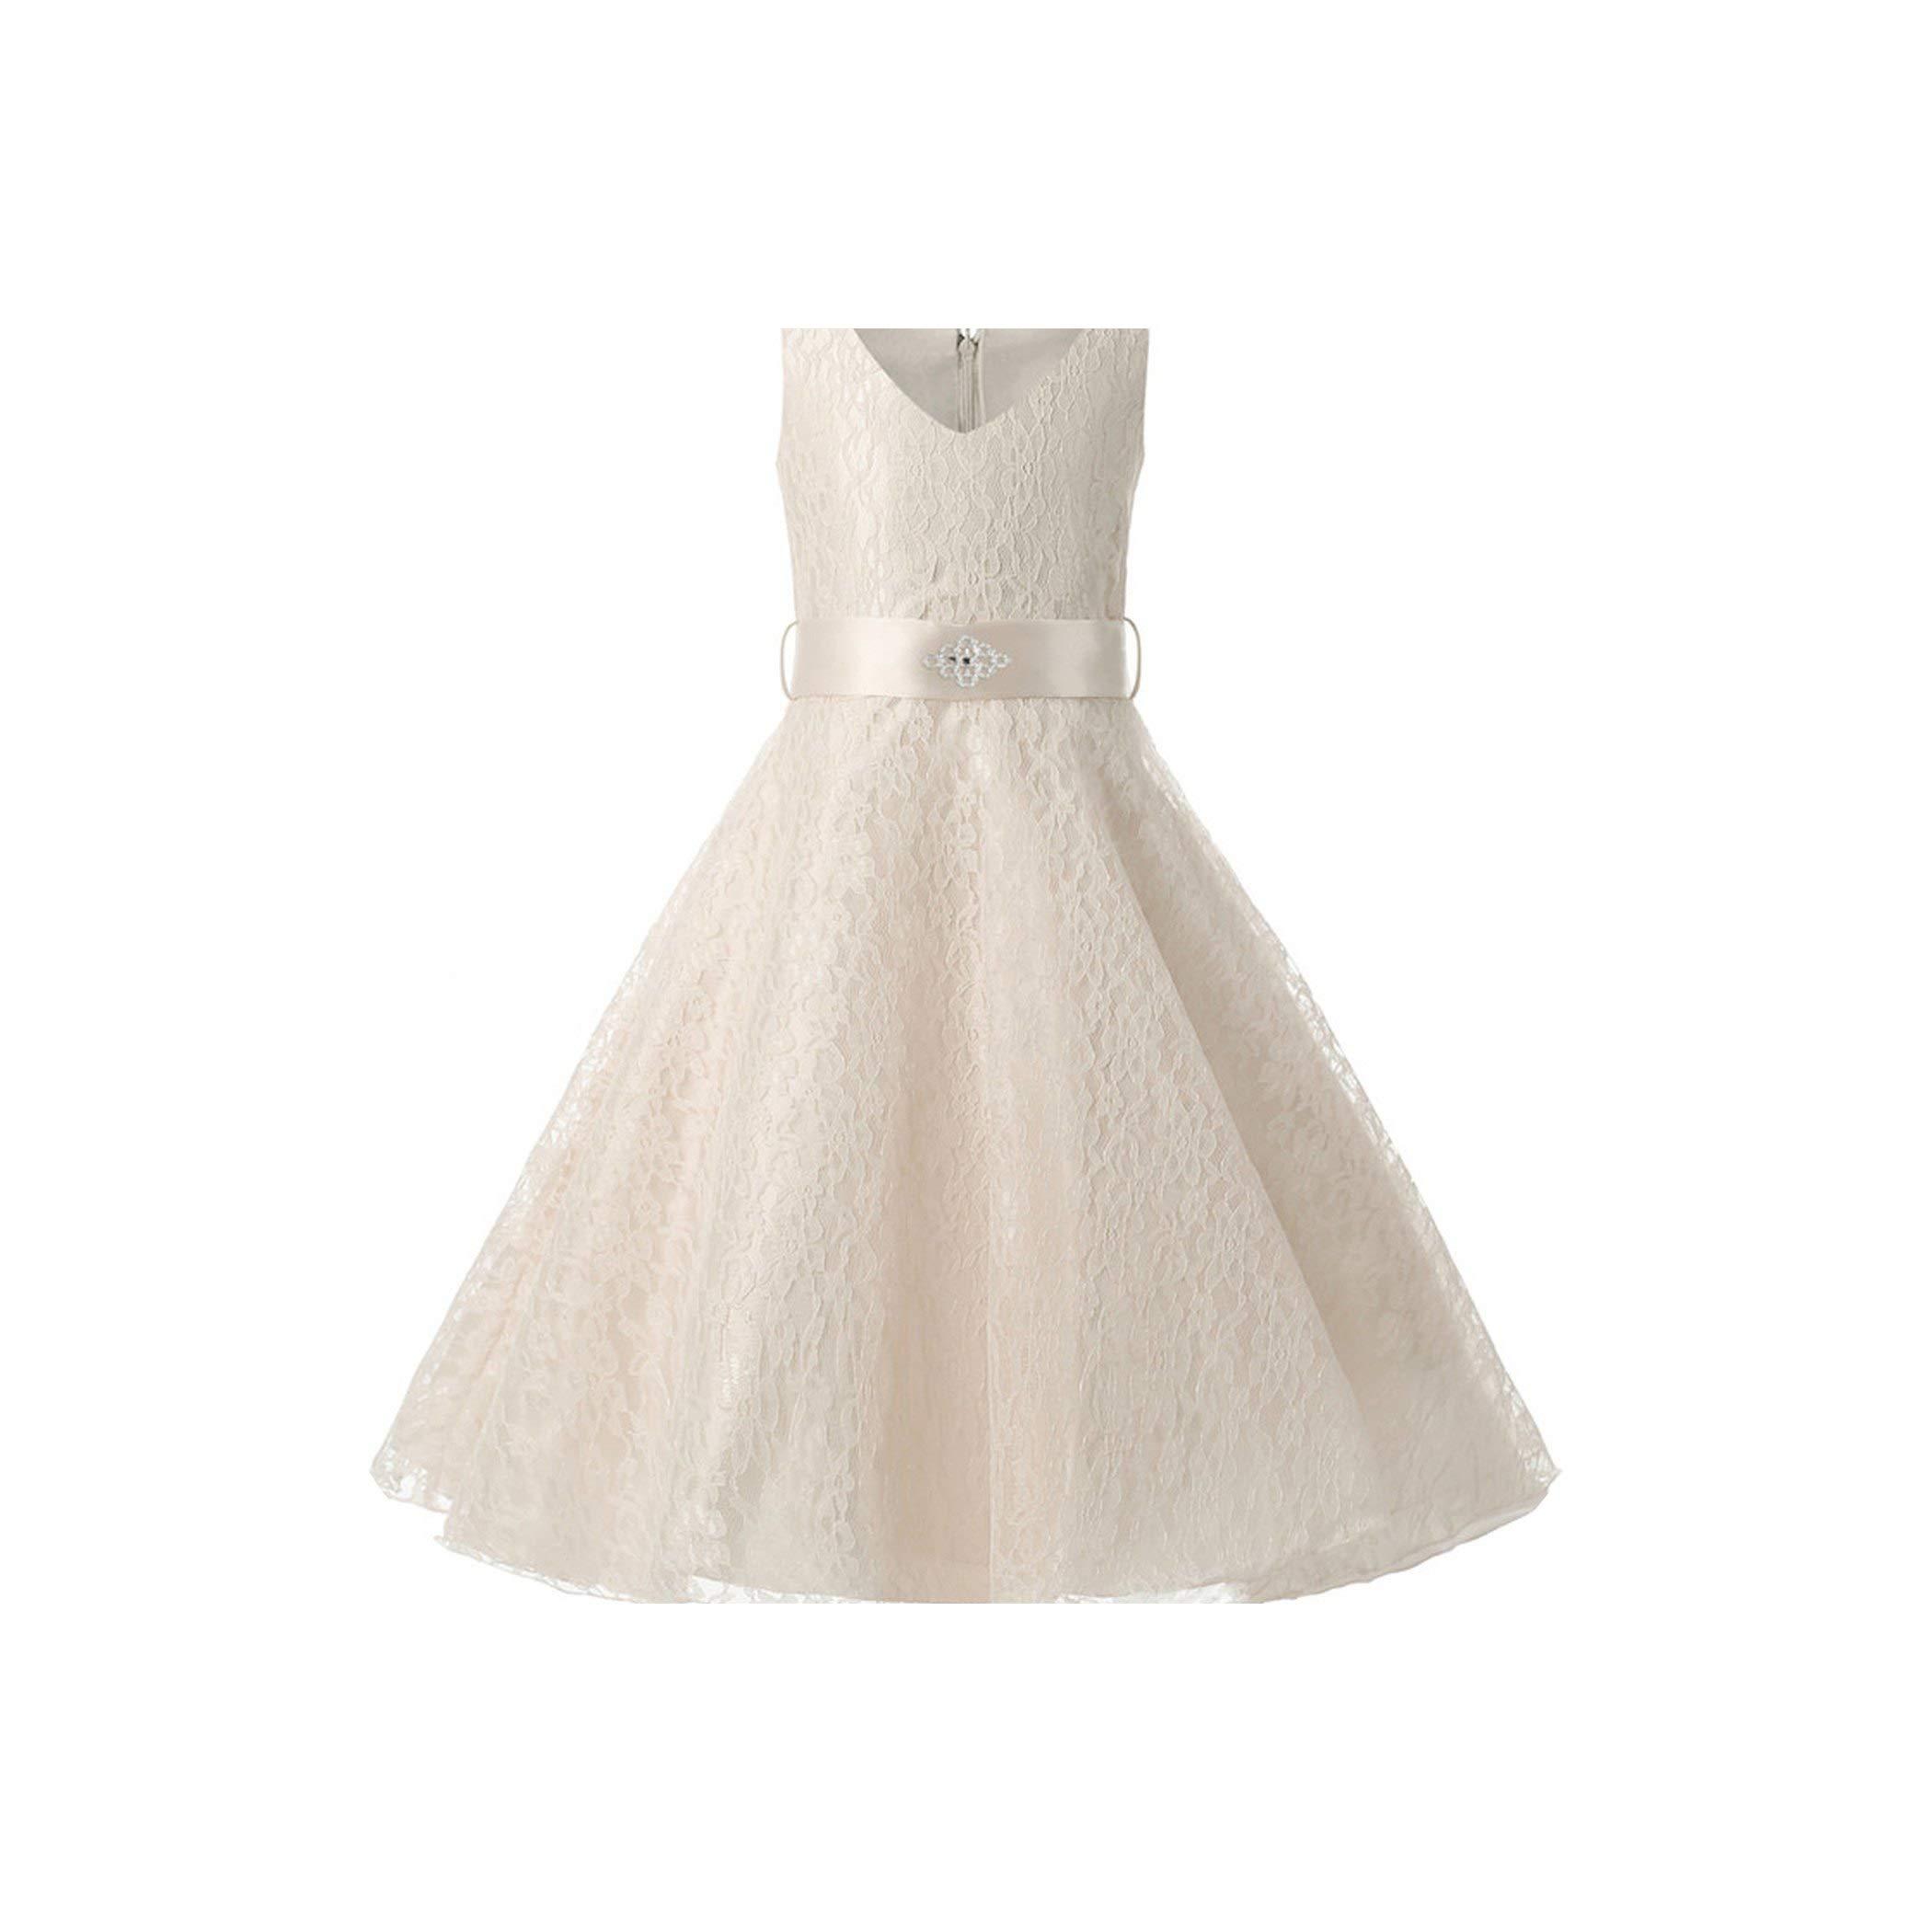 Princess Costume Kids Dresses for Girls Teenagers Children Flower Party Girls Dress Wedding Dress,MB,6